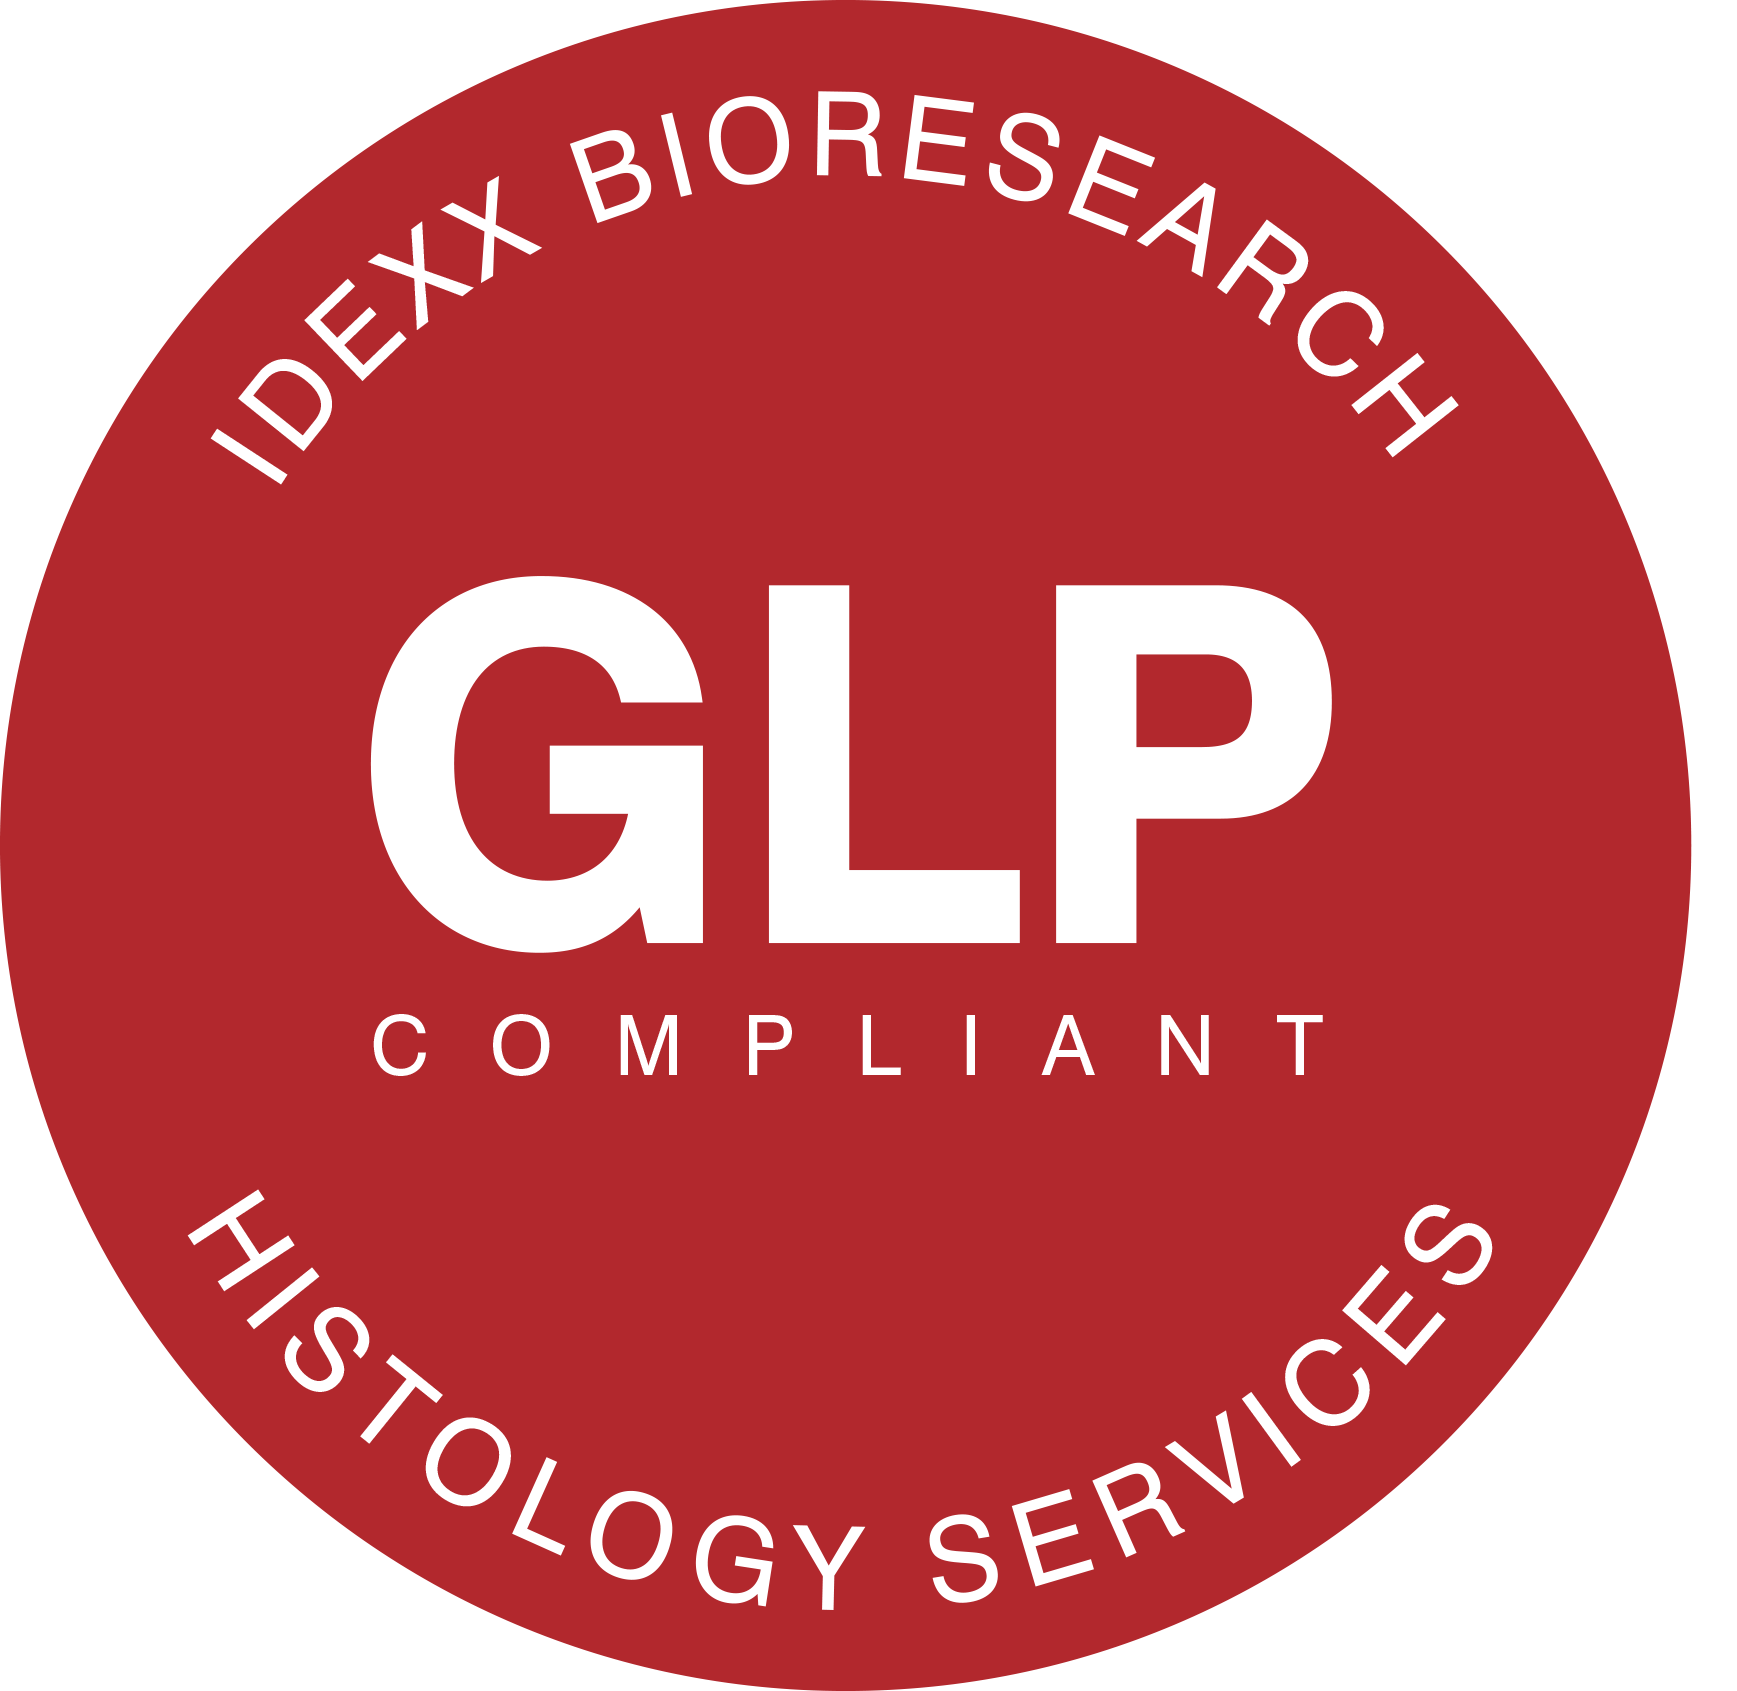 GLP_Compliant_logo_v6